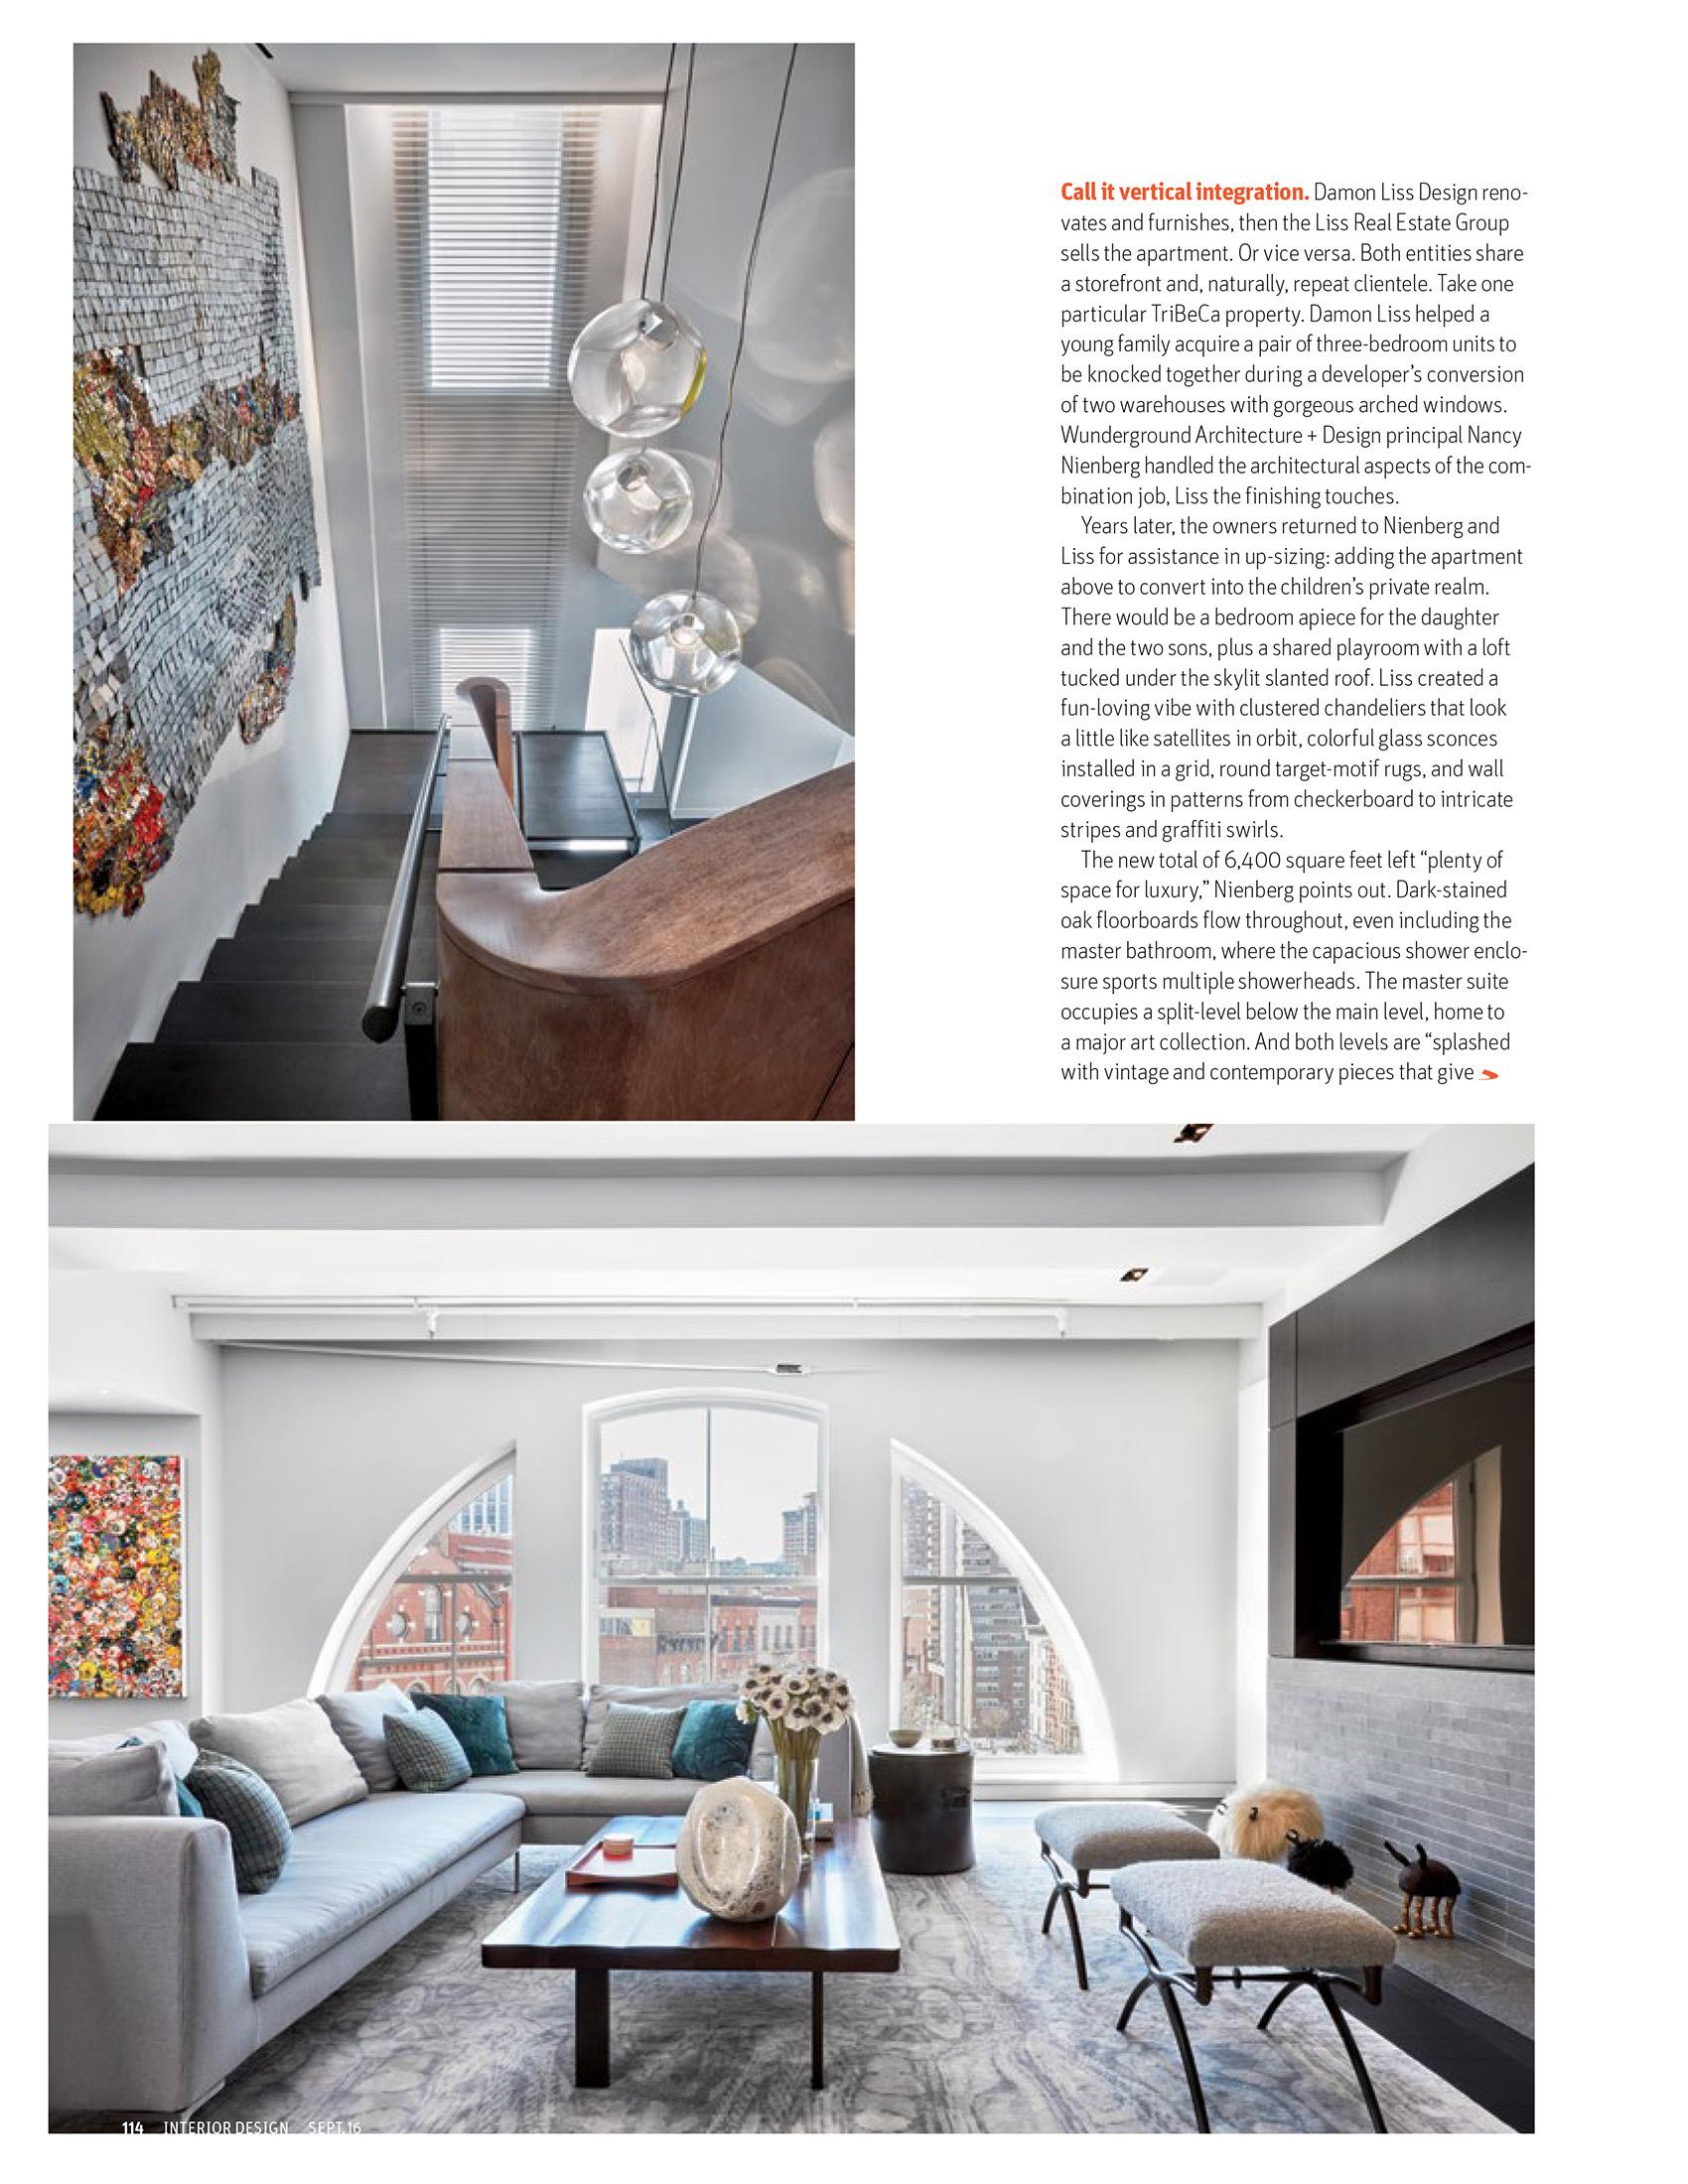 Interior-Design_161-Duane-St_Oct-16_Page-2A.jpg